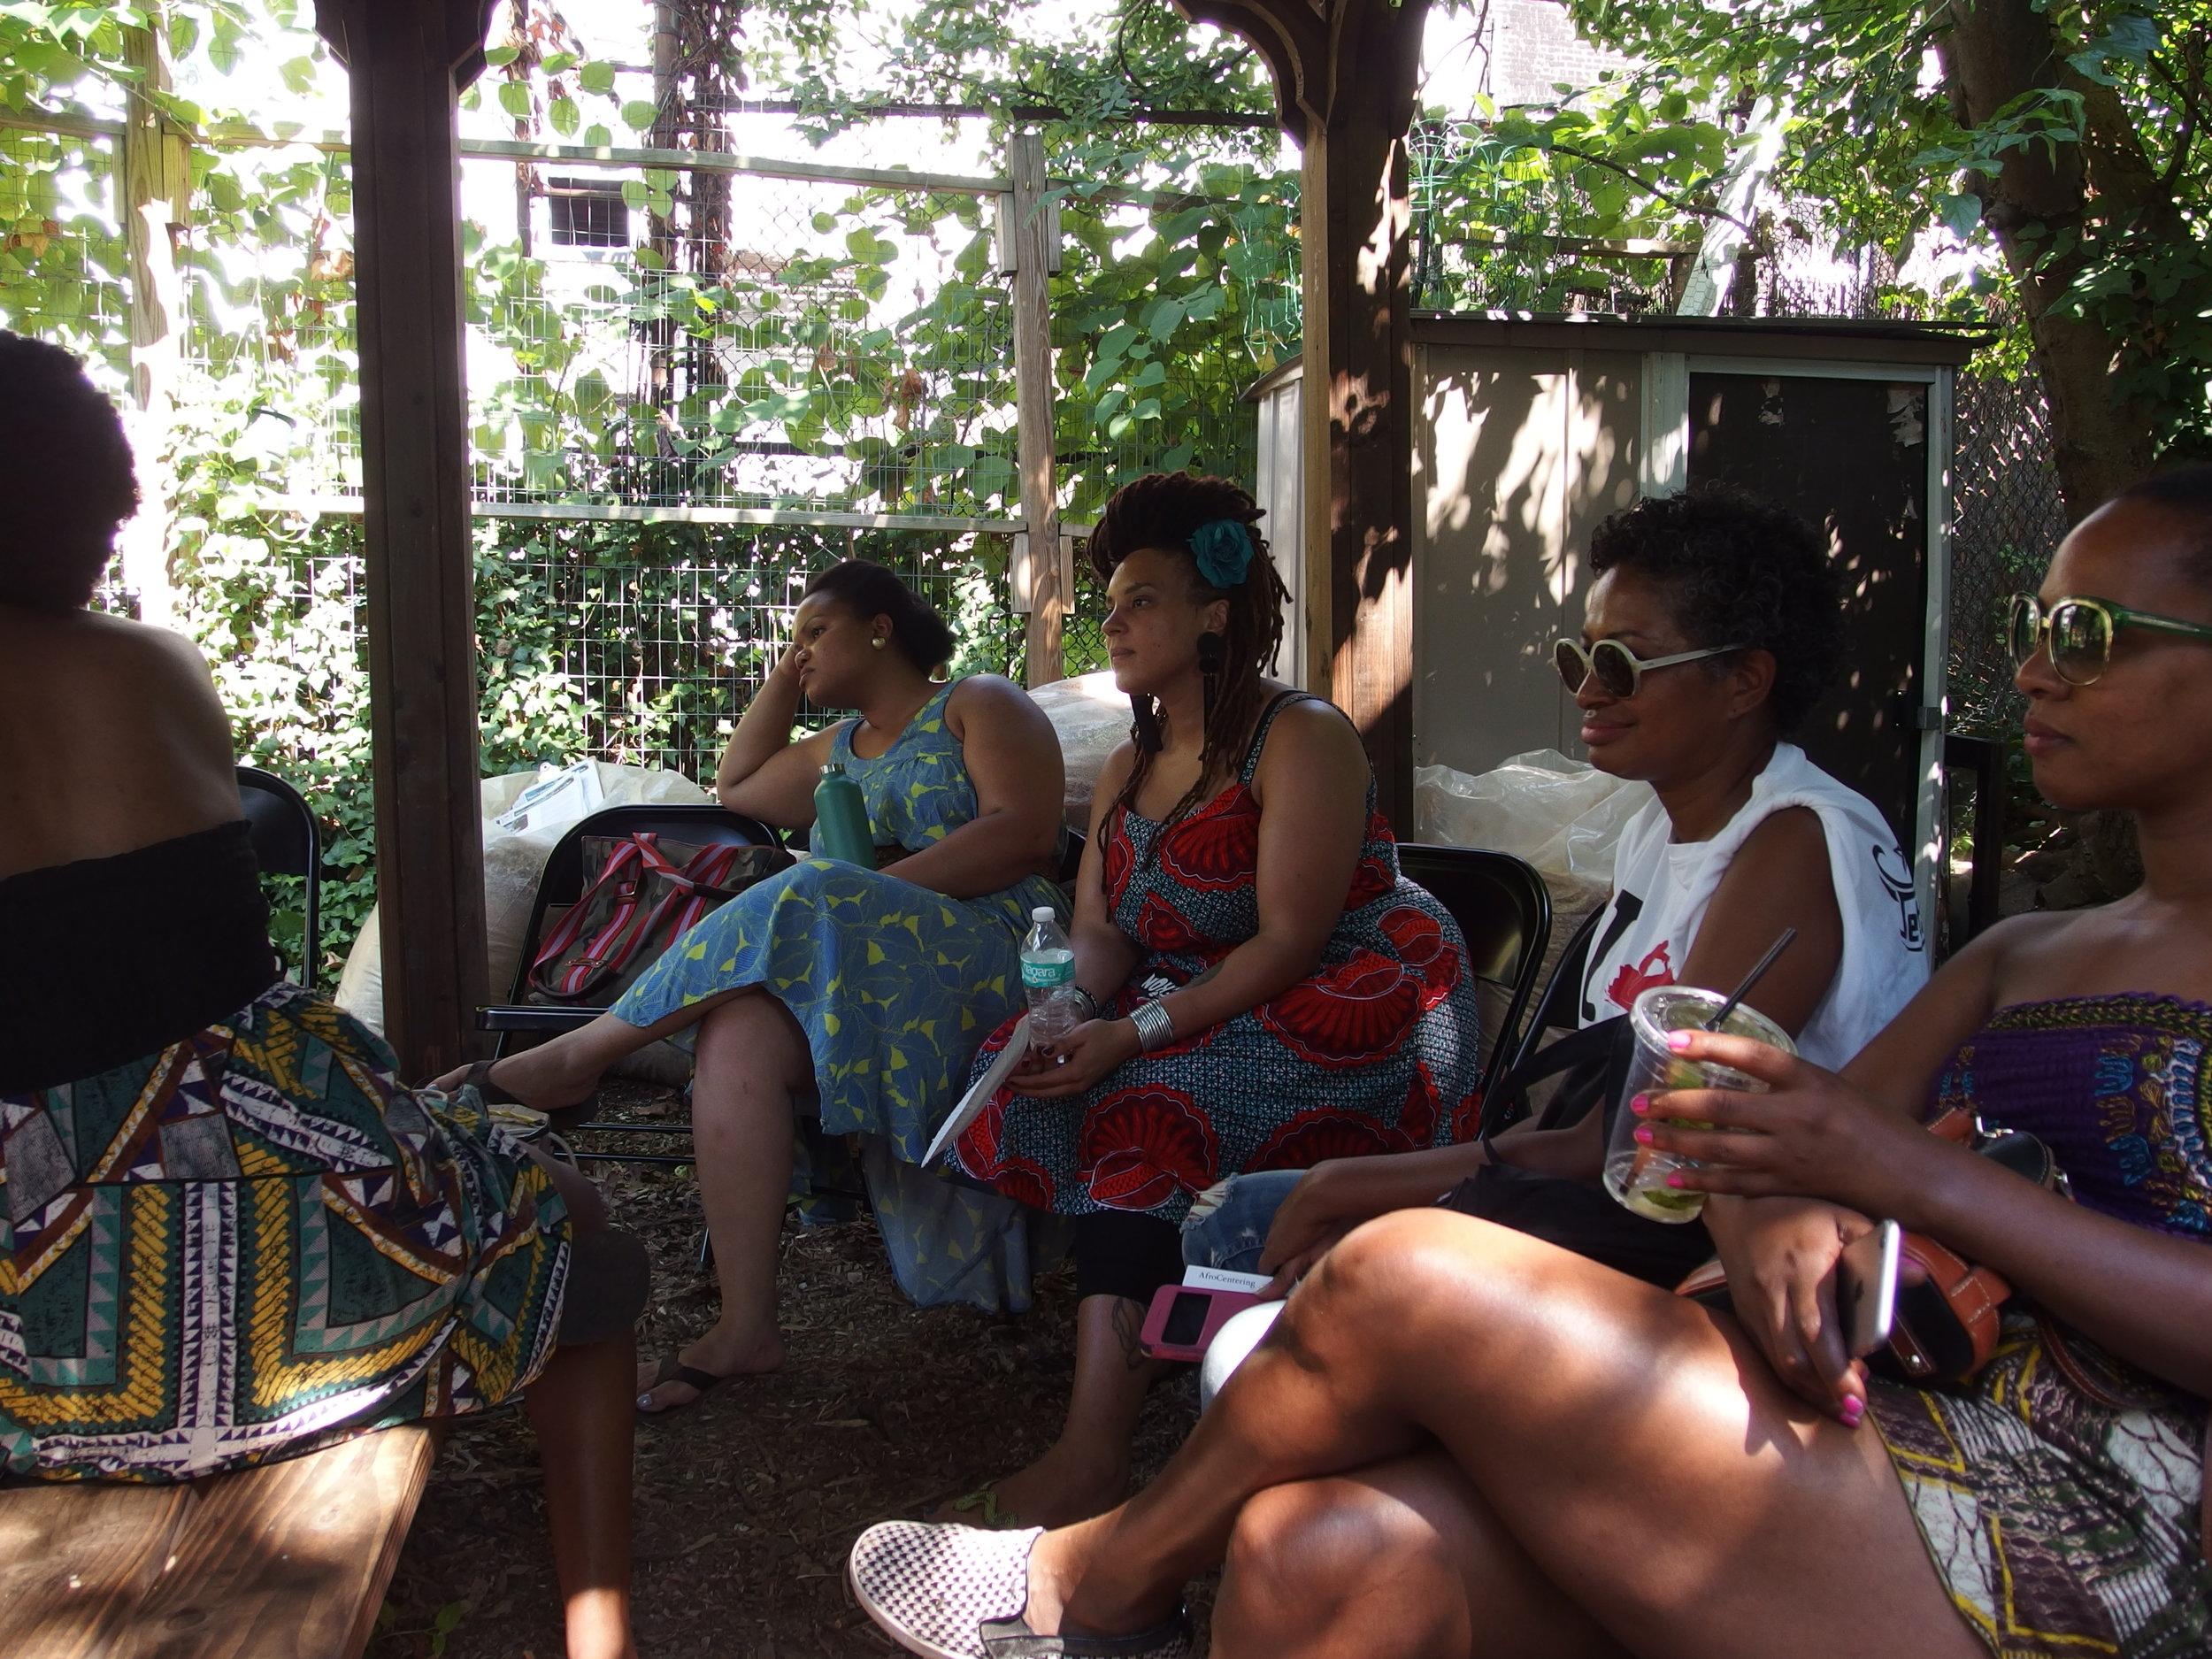 little-free-black-womens-library_20951106575_o.jpg